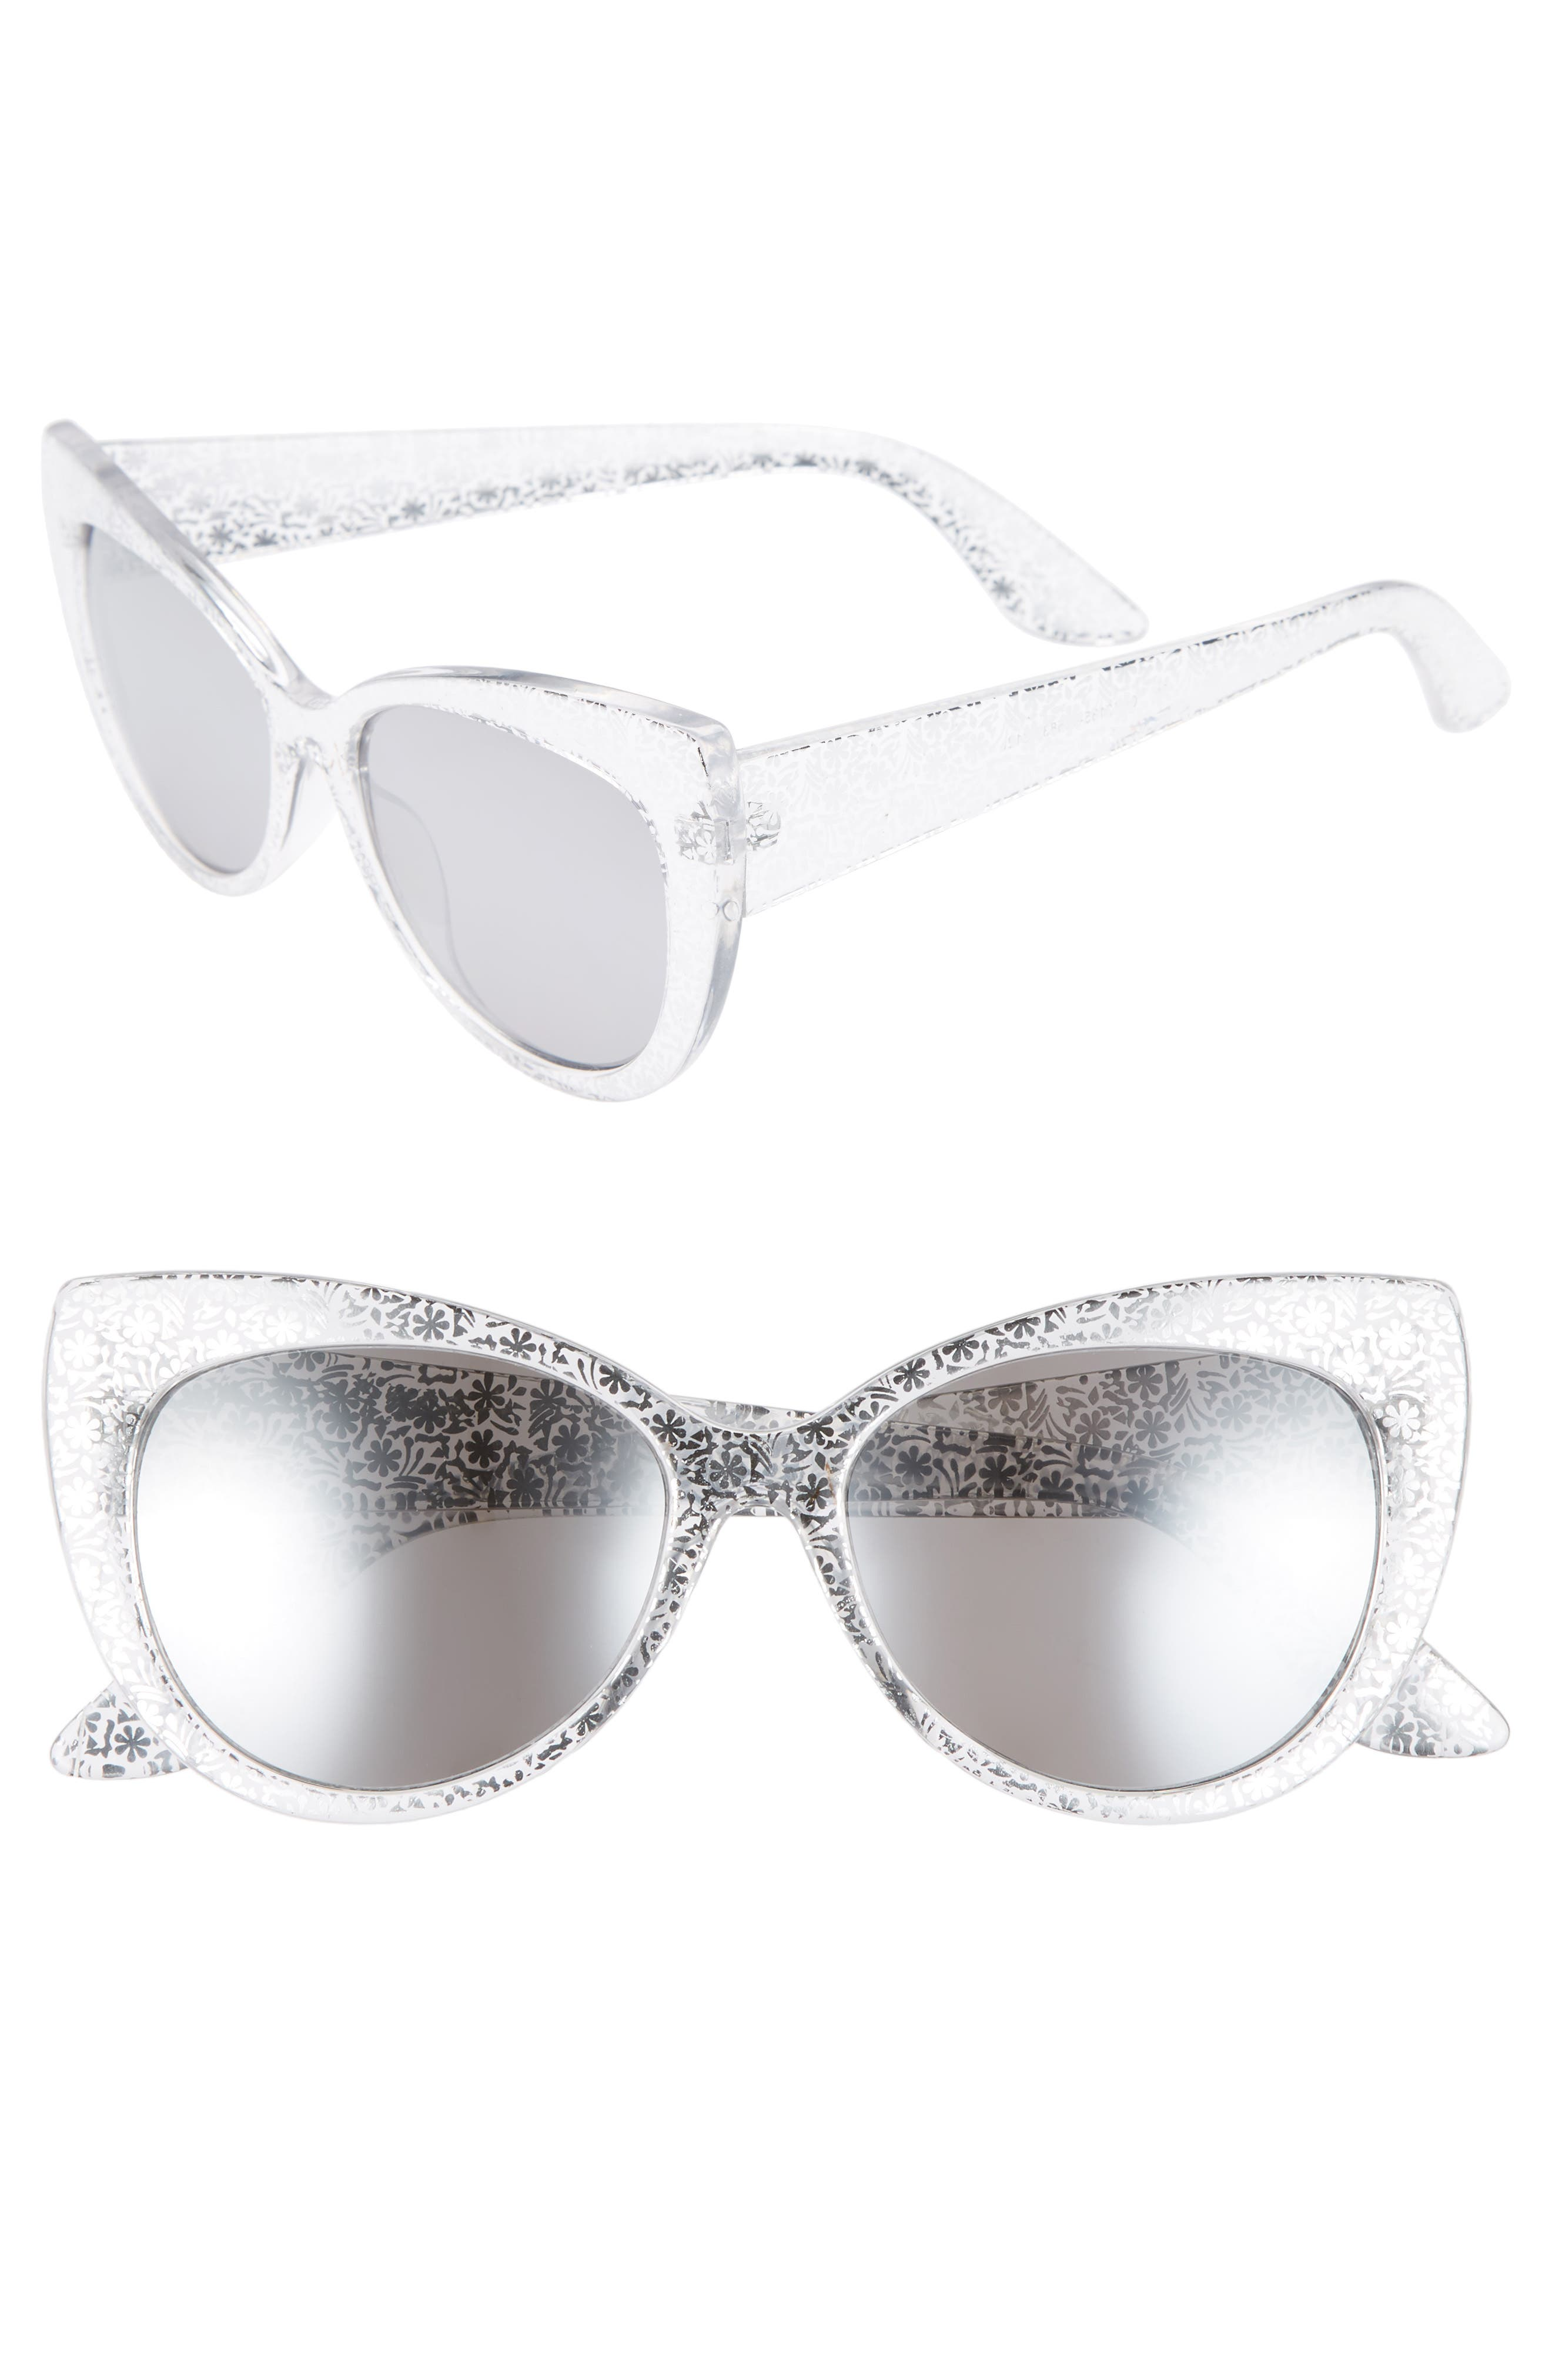 55mm Floral Cat Eye Sunglasses,                             Main thumbnail 1, color,